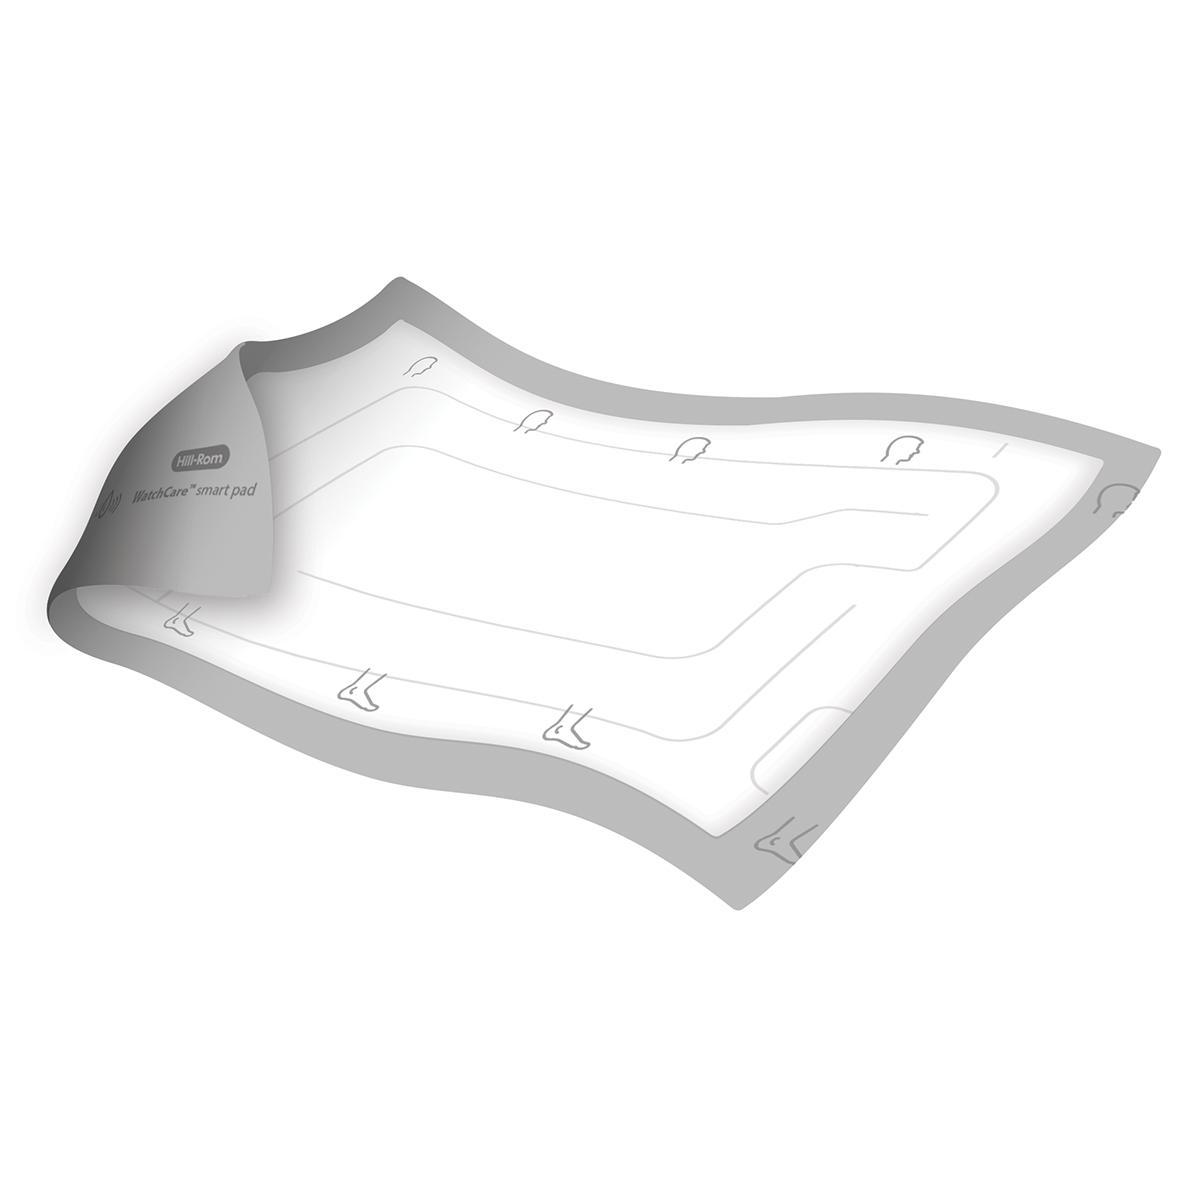 WatchCare absorbent smart pad